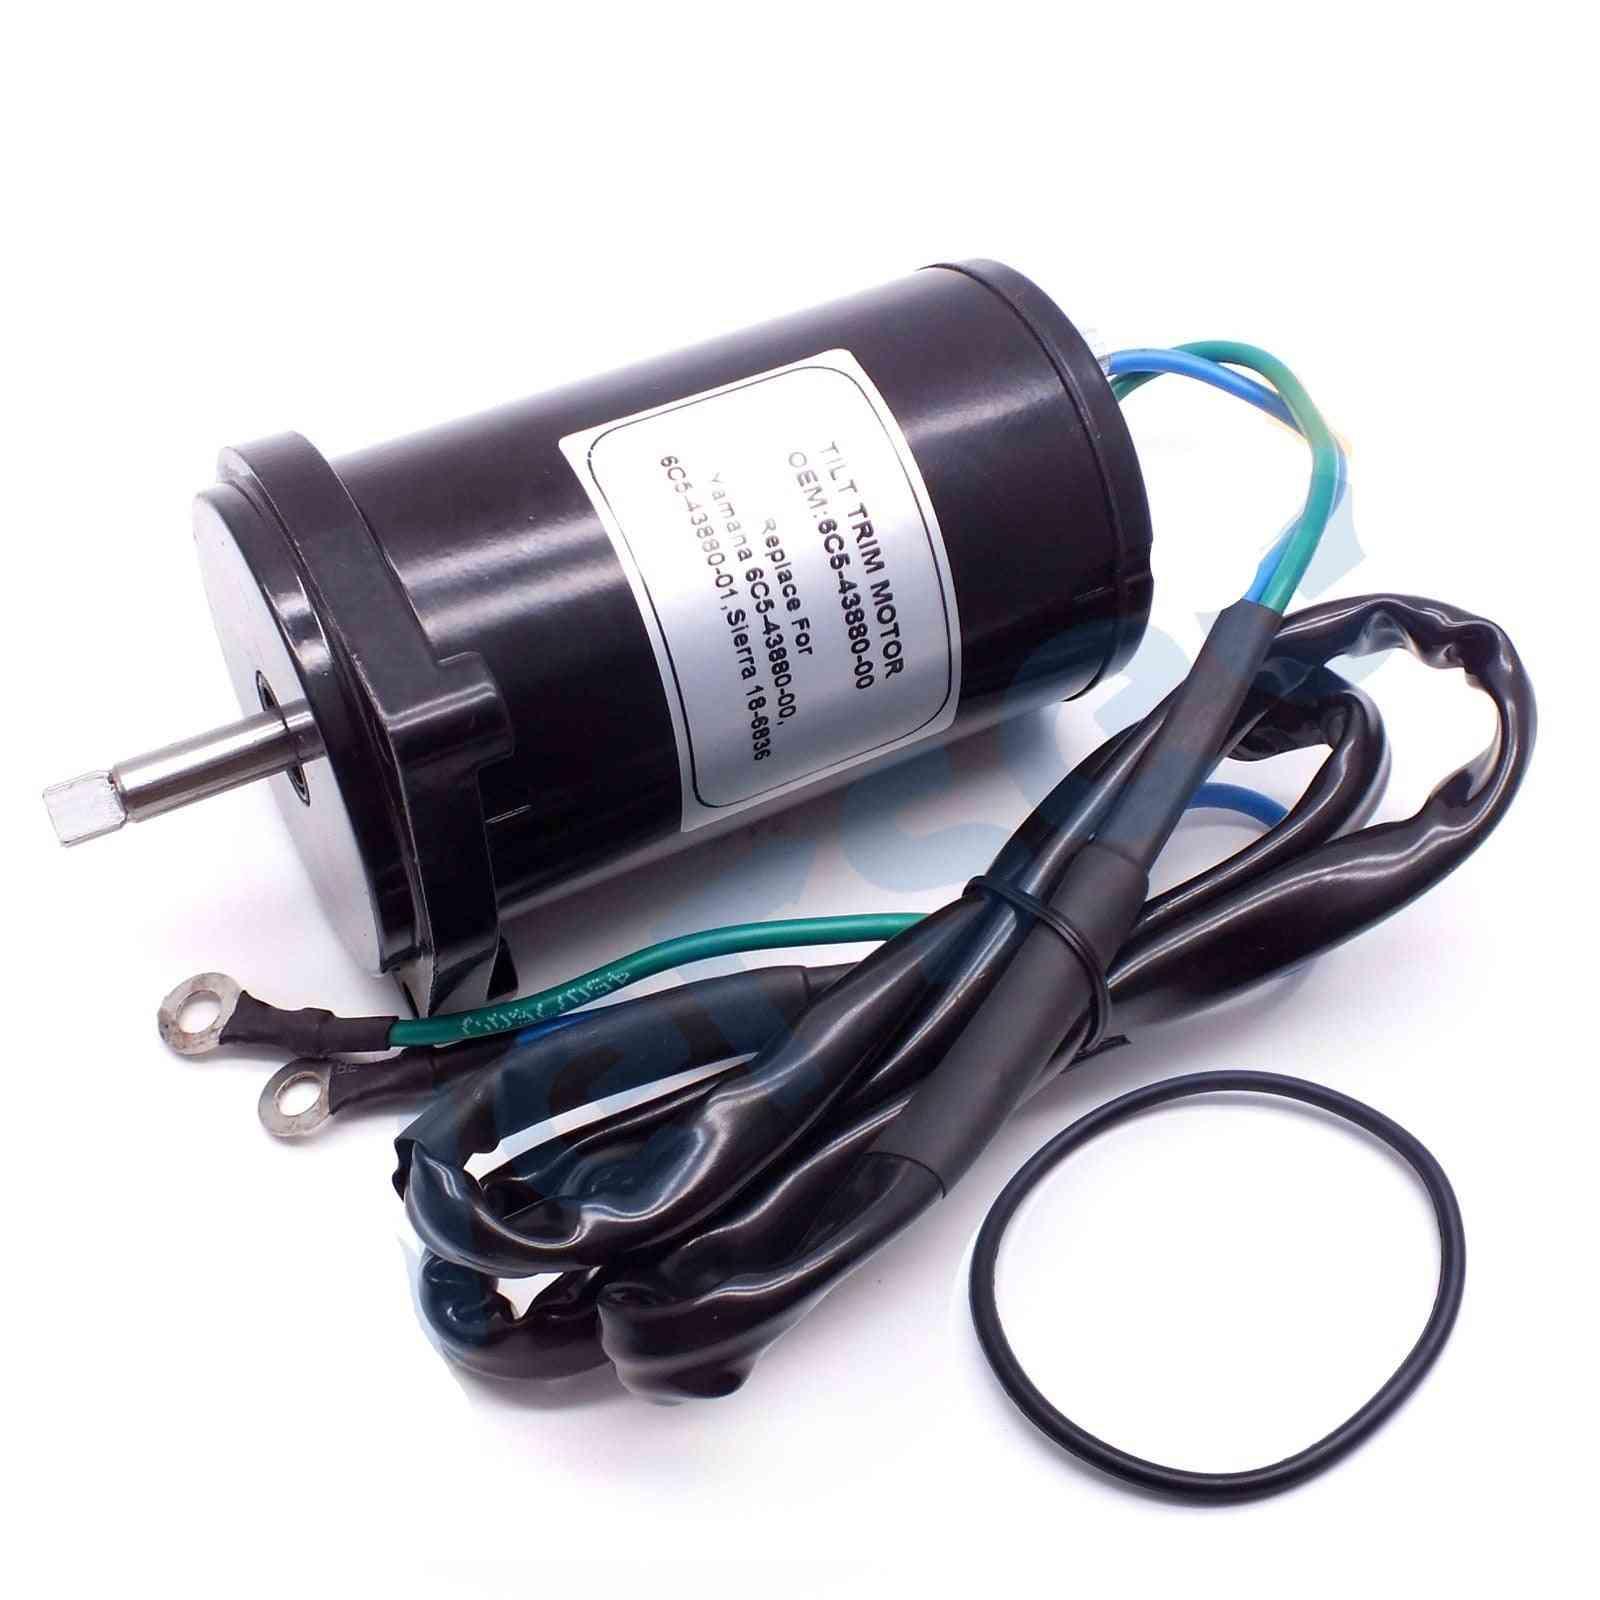 Power Tilt Trim Motor For Yamaha Outboard Motor